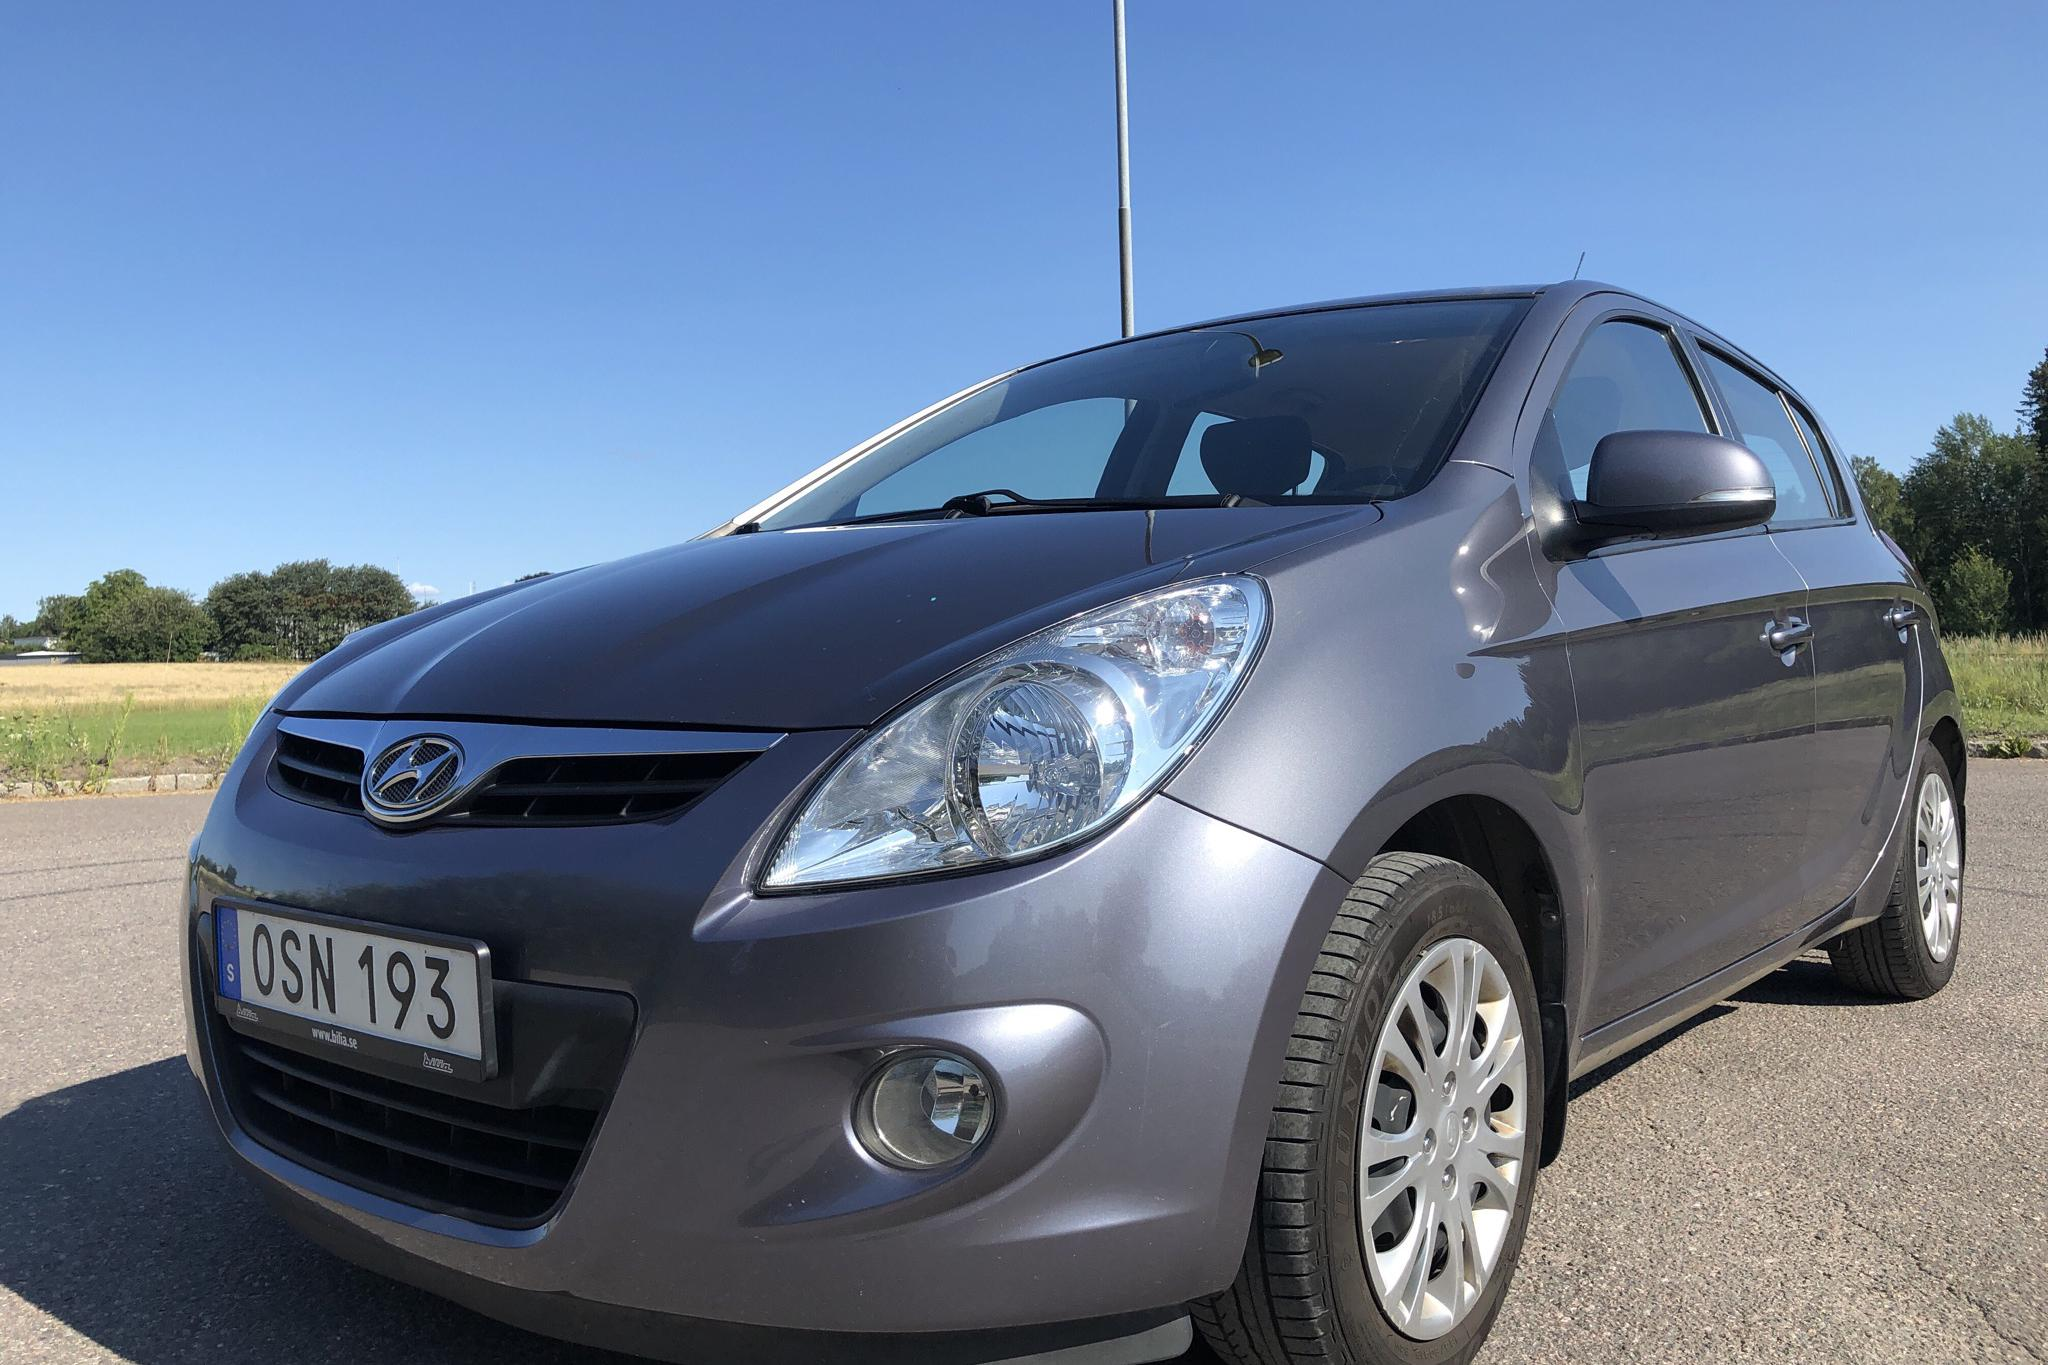 Hyundai i20 1.2 (78hk) - 53 830 km - Manual - Dark Grey - 2012